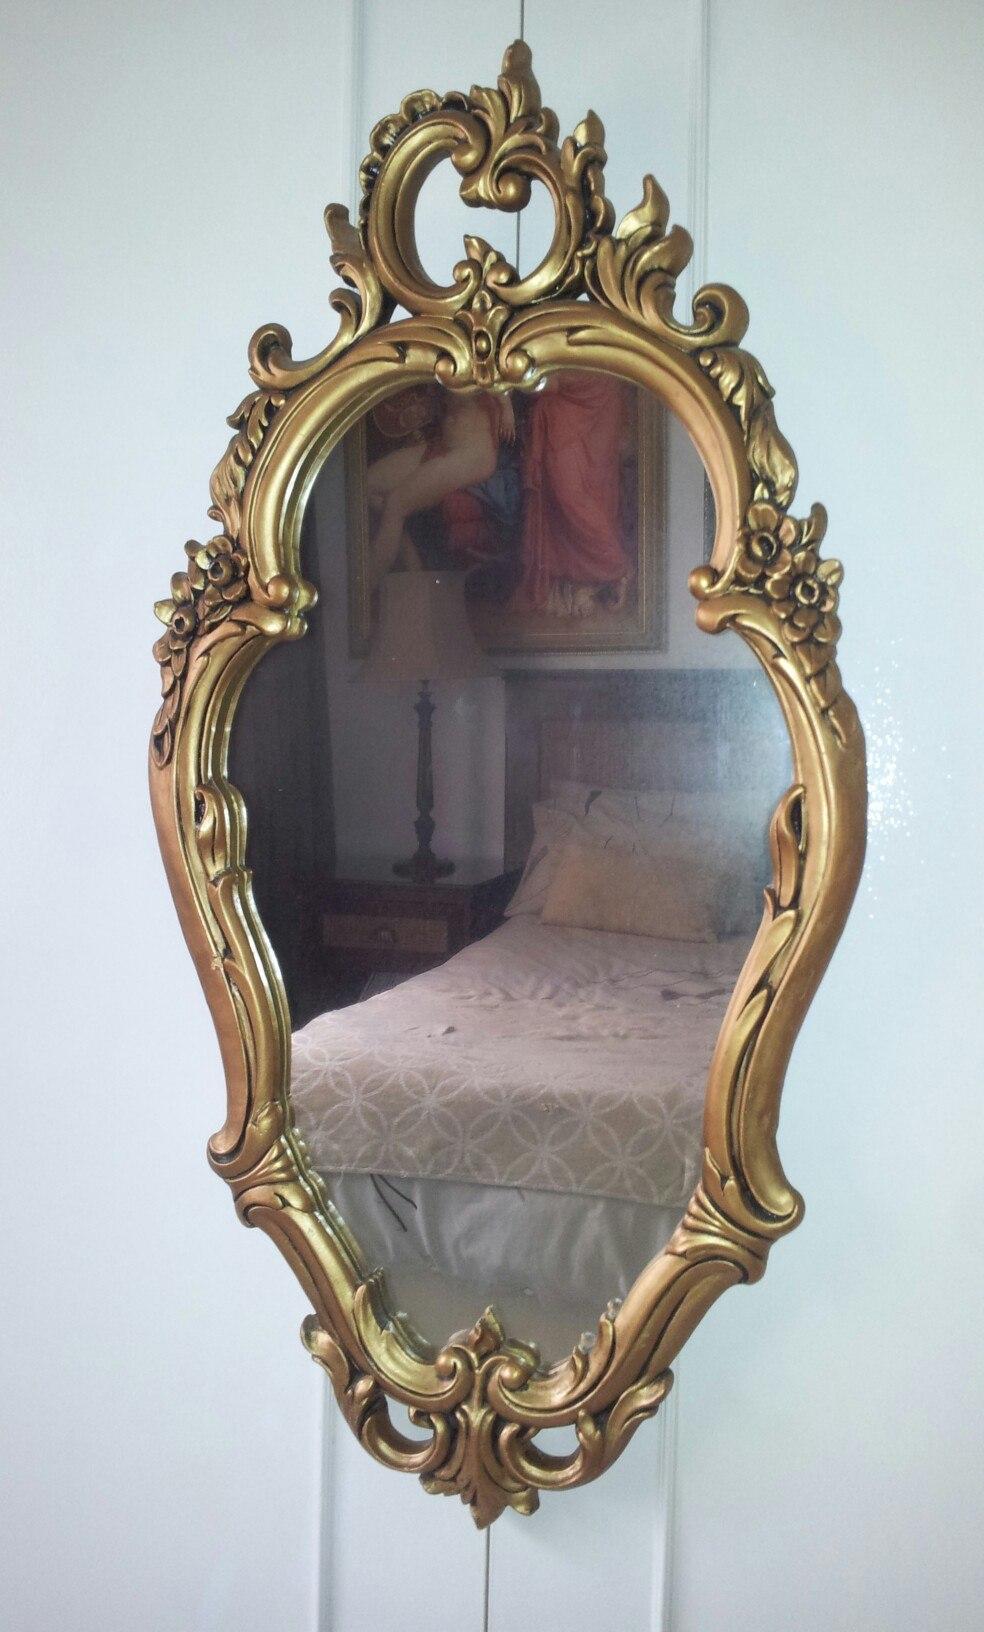 Wiki rococo upcscavenger for Italian baroque mirror